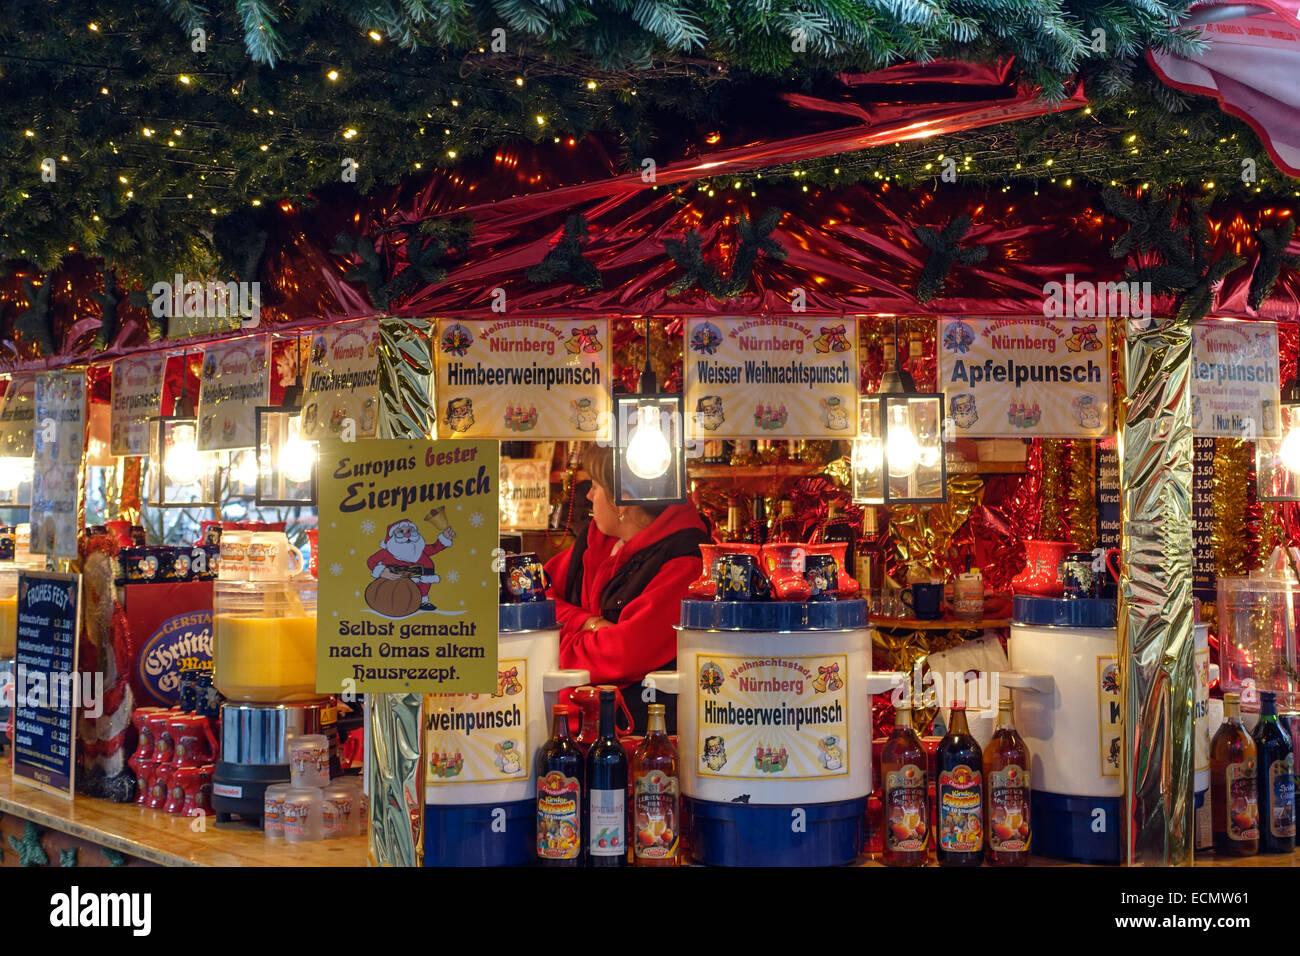 Nuremberg Christmas Market Gluhwein Stock Photos & Nuremberg ...